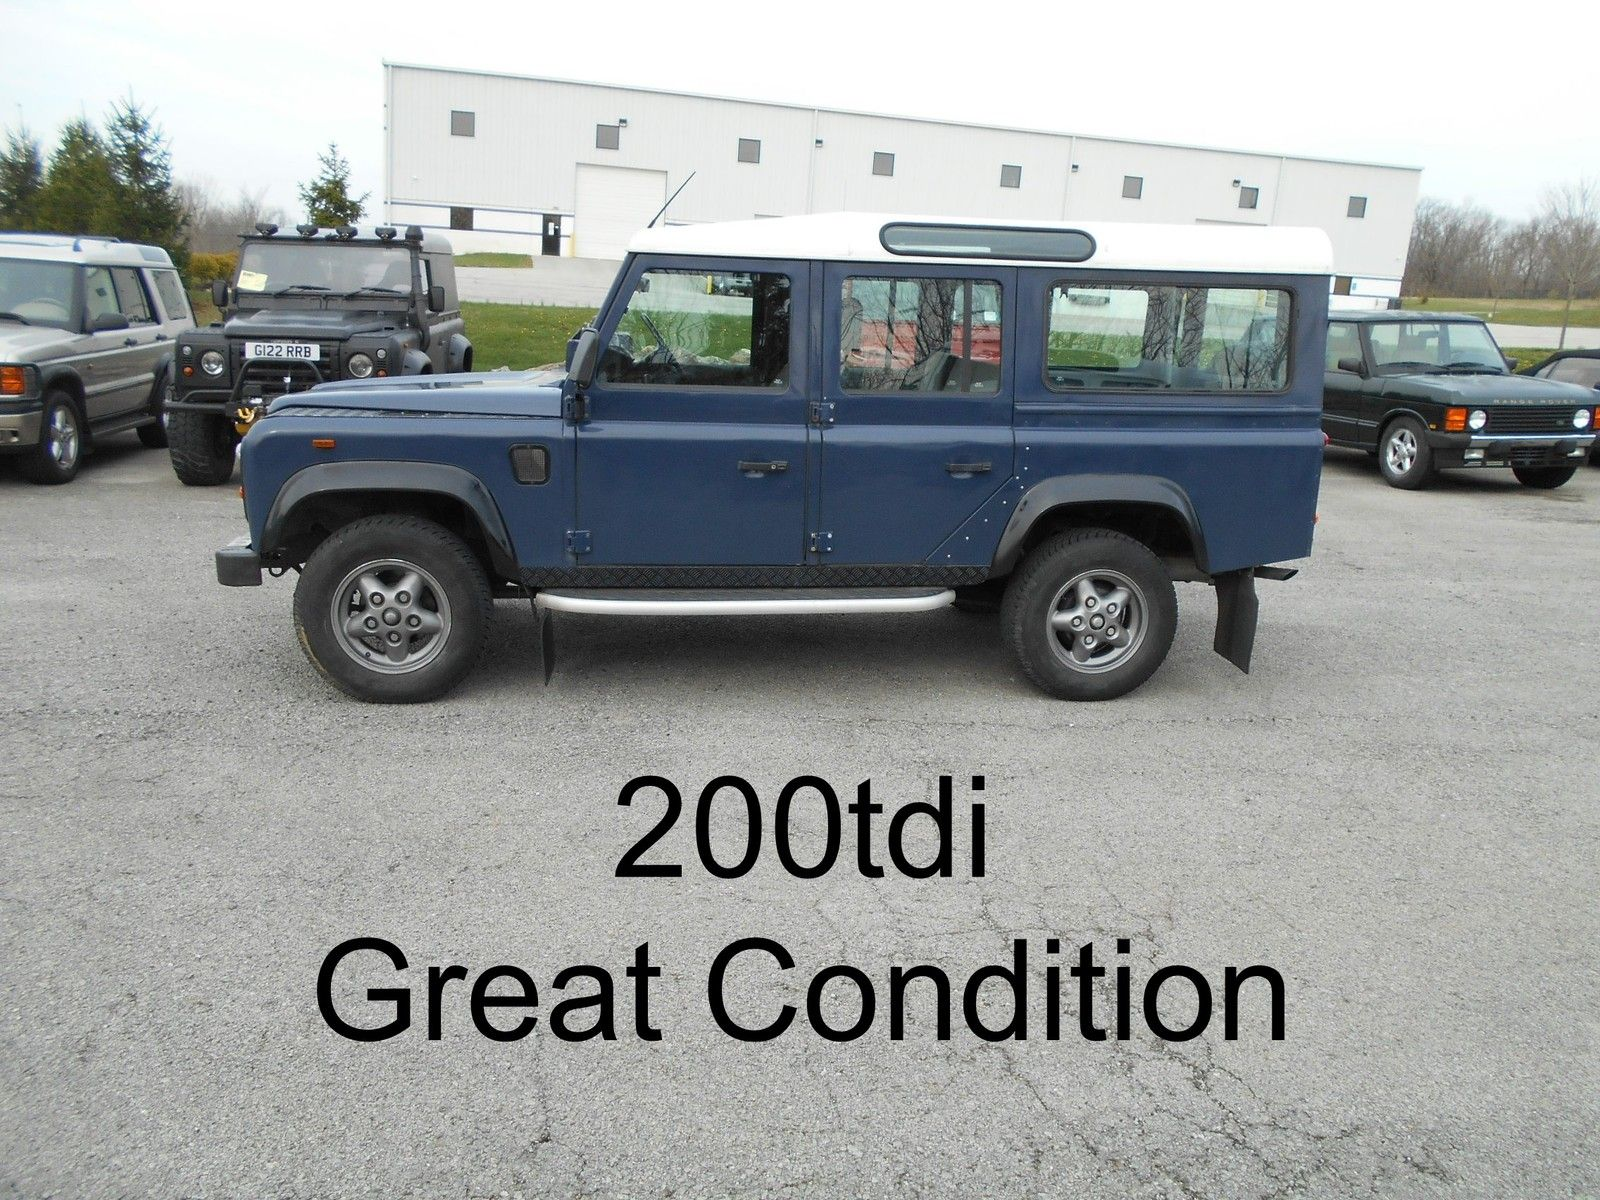 Used 1990 Land Rover Defender 110 for sale in LaGrange, KY